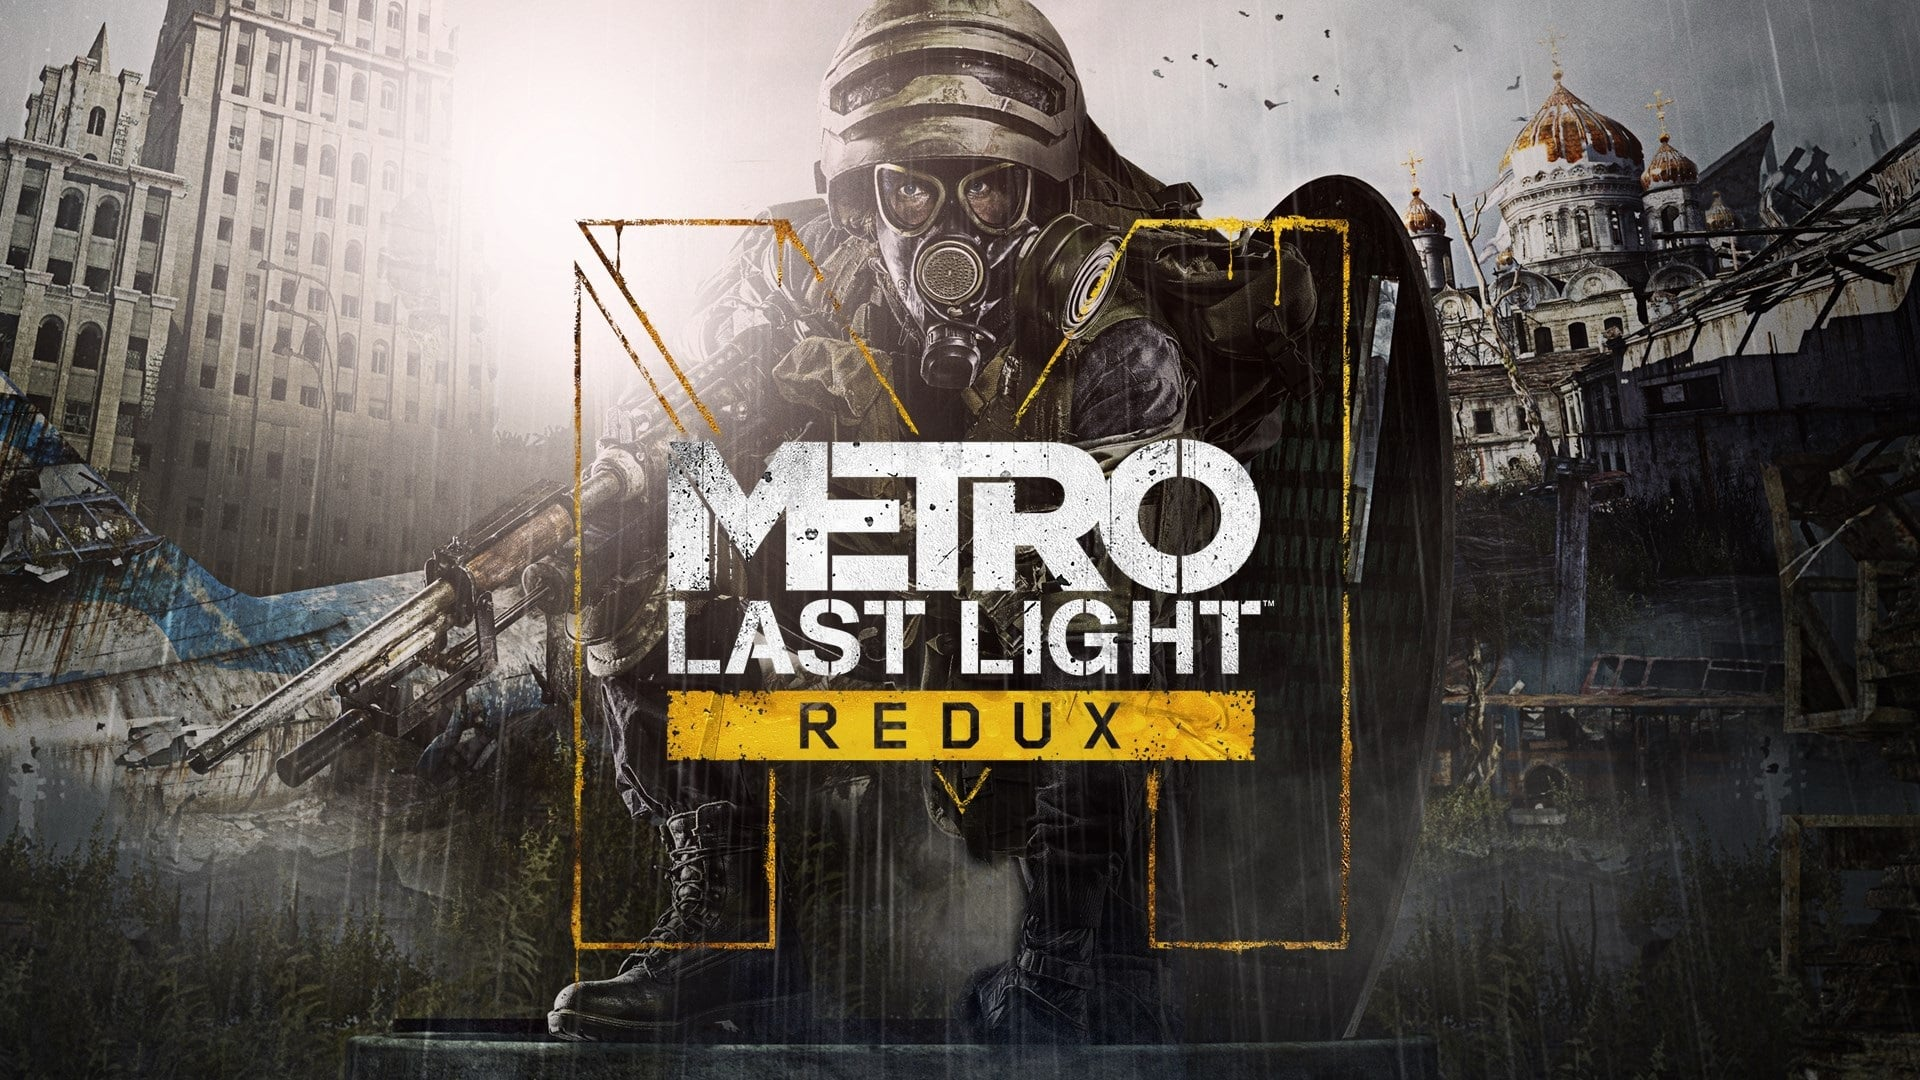 Metro Last Light Redux Win 10 Achievement List Revealed